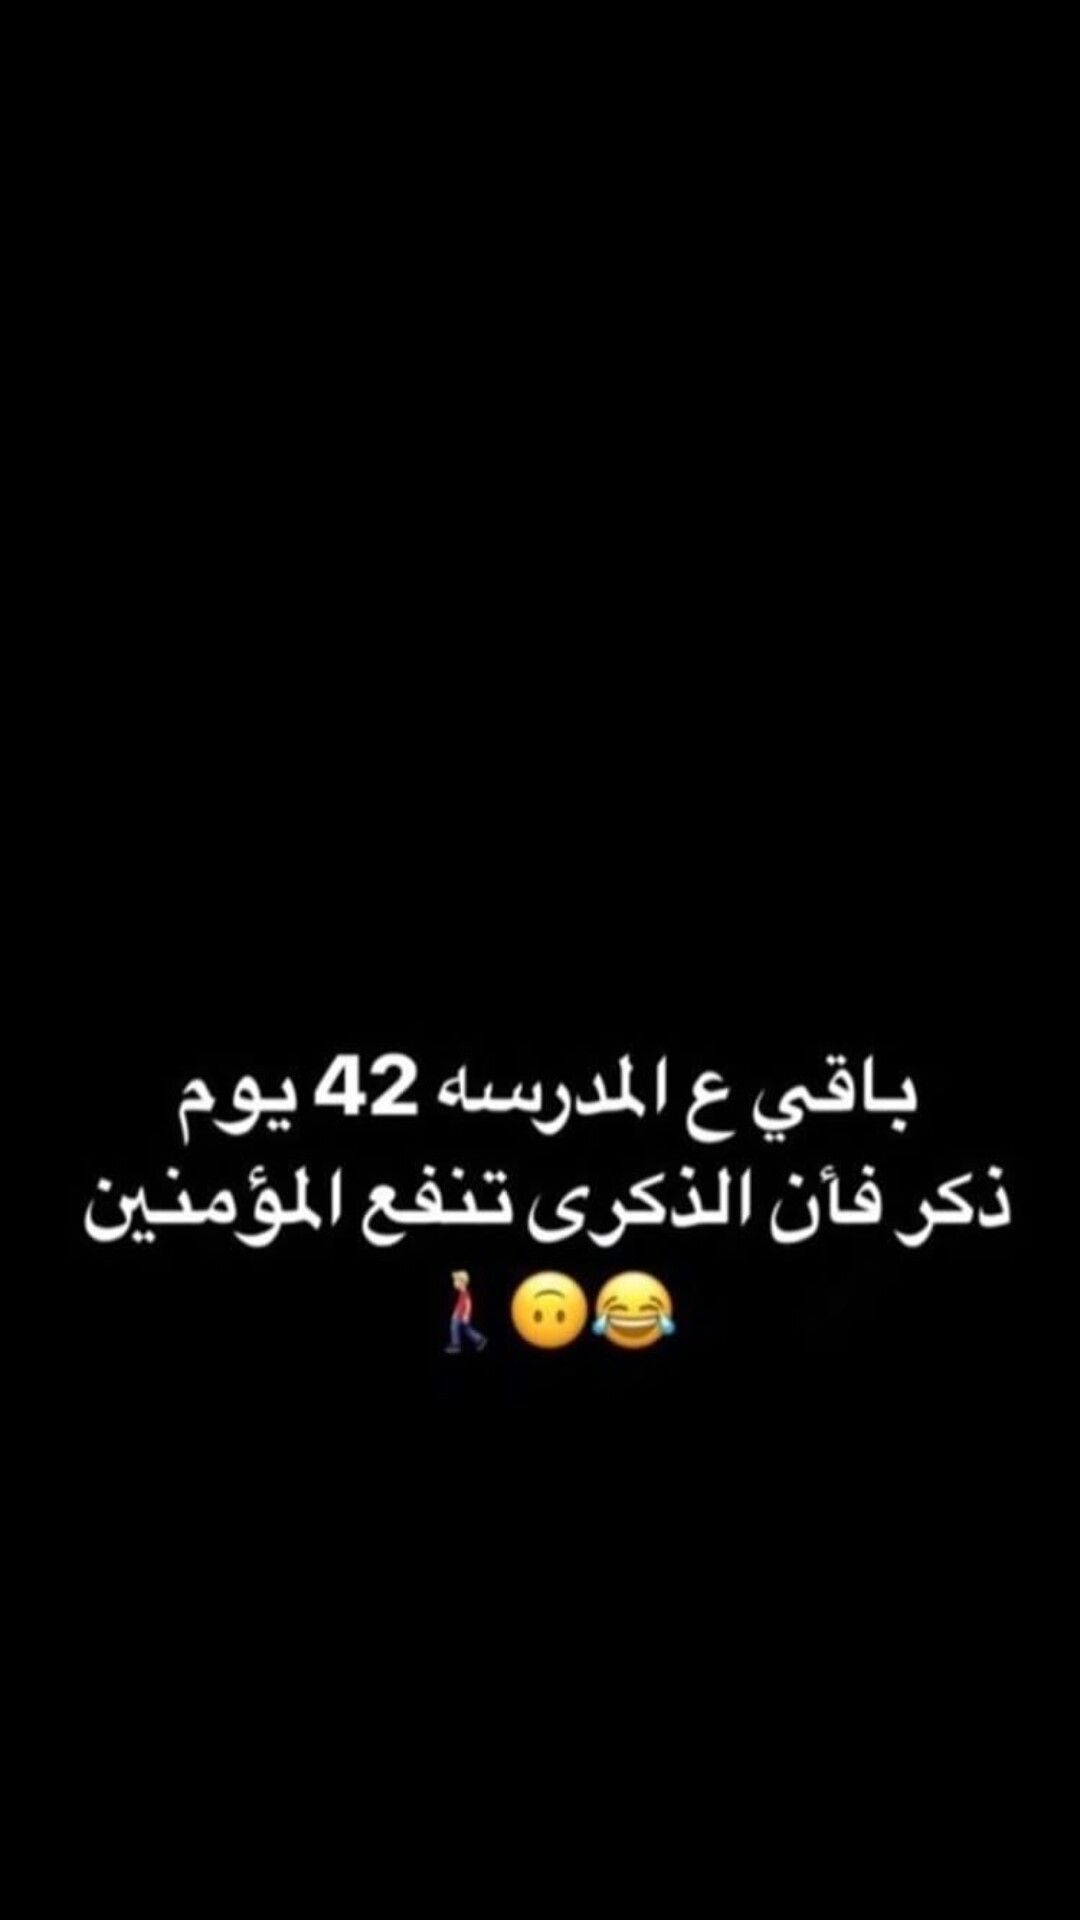 كم باقي على المدرسه H G Funny Quotes Funny Messages Funny Arabic Quotes